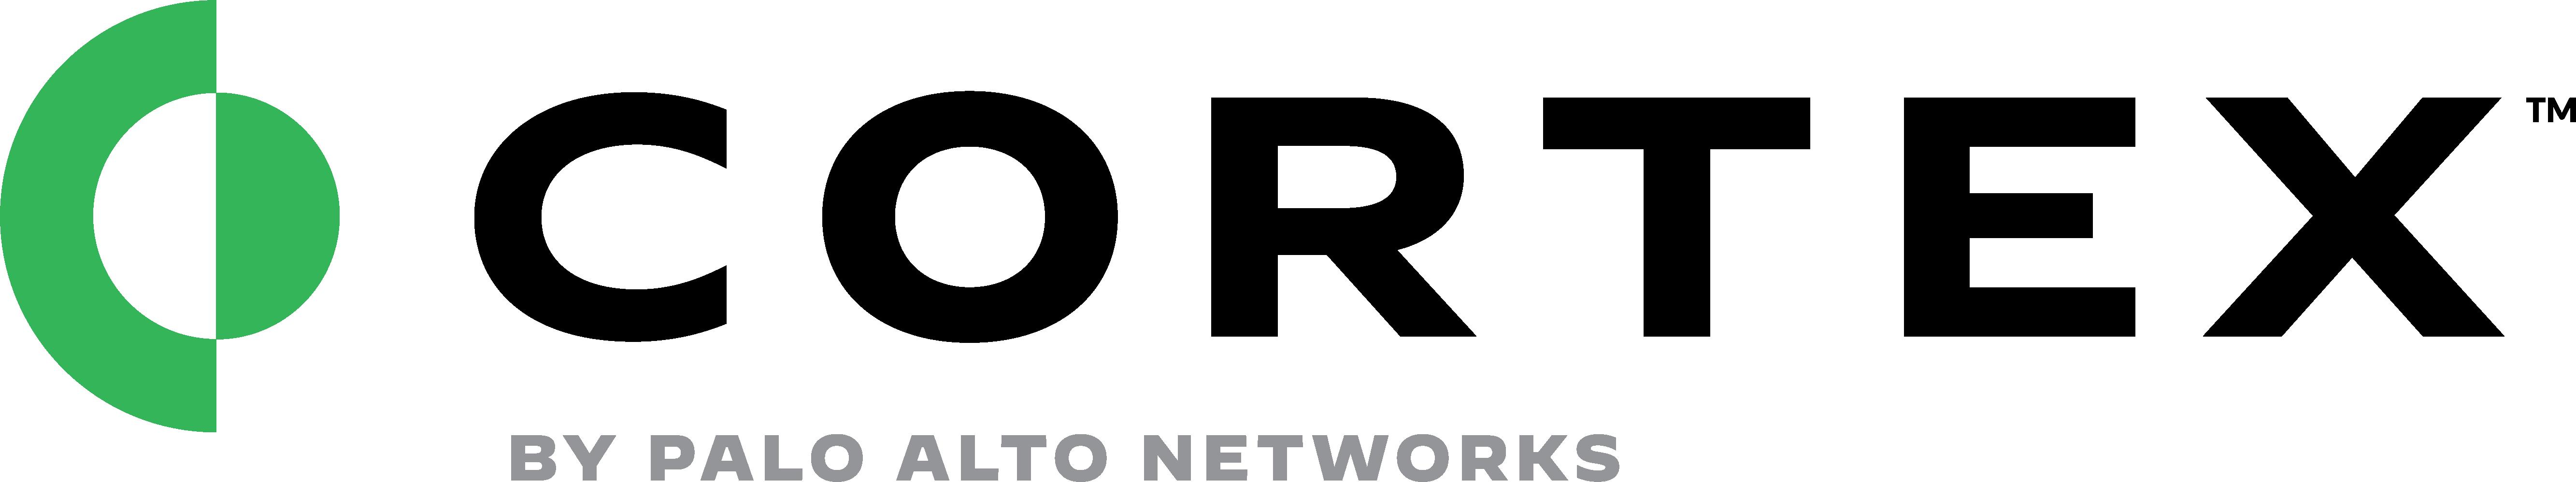 Cortex_Tagline_Logo_CMYK-01.png